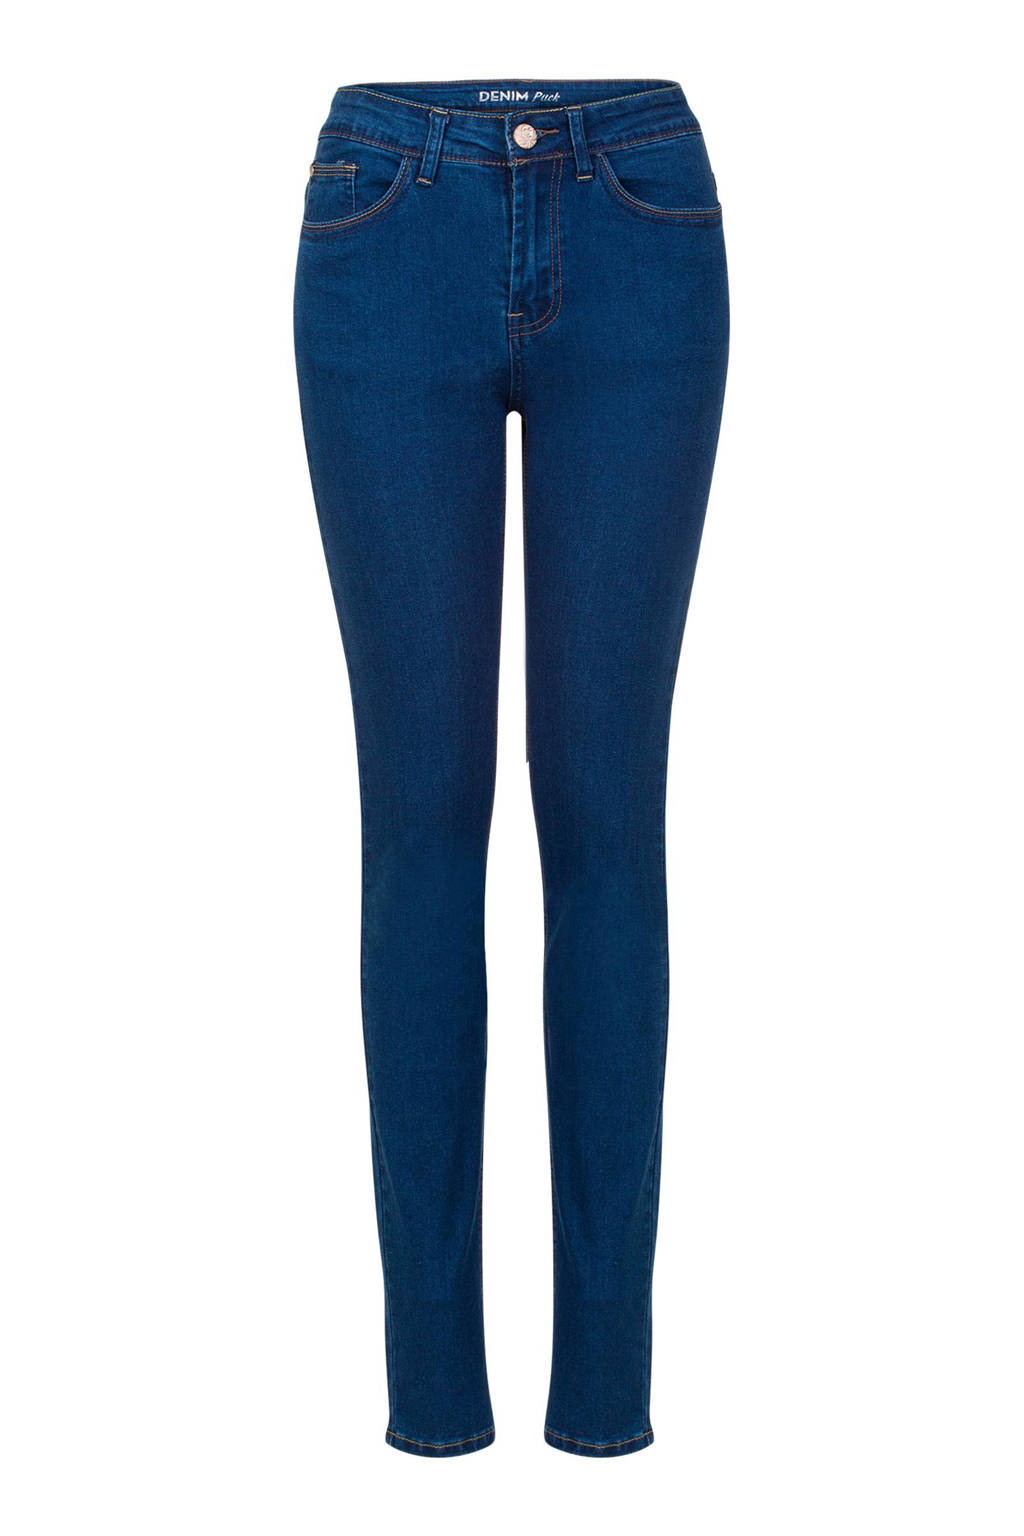 Miss Etam Lang slim fit jeans 36 inch, Dark denim